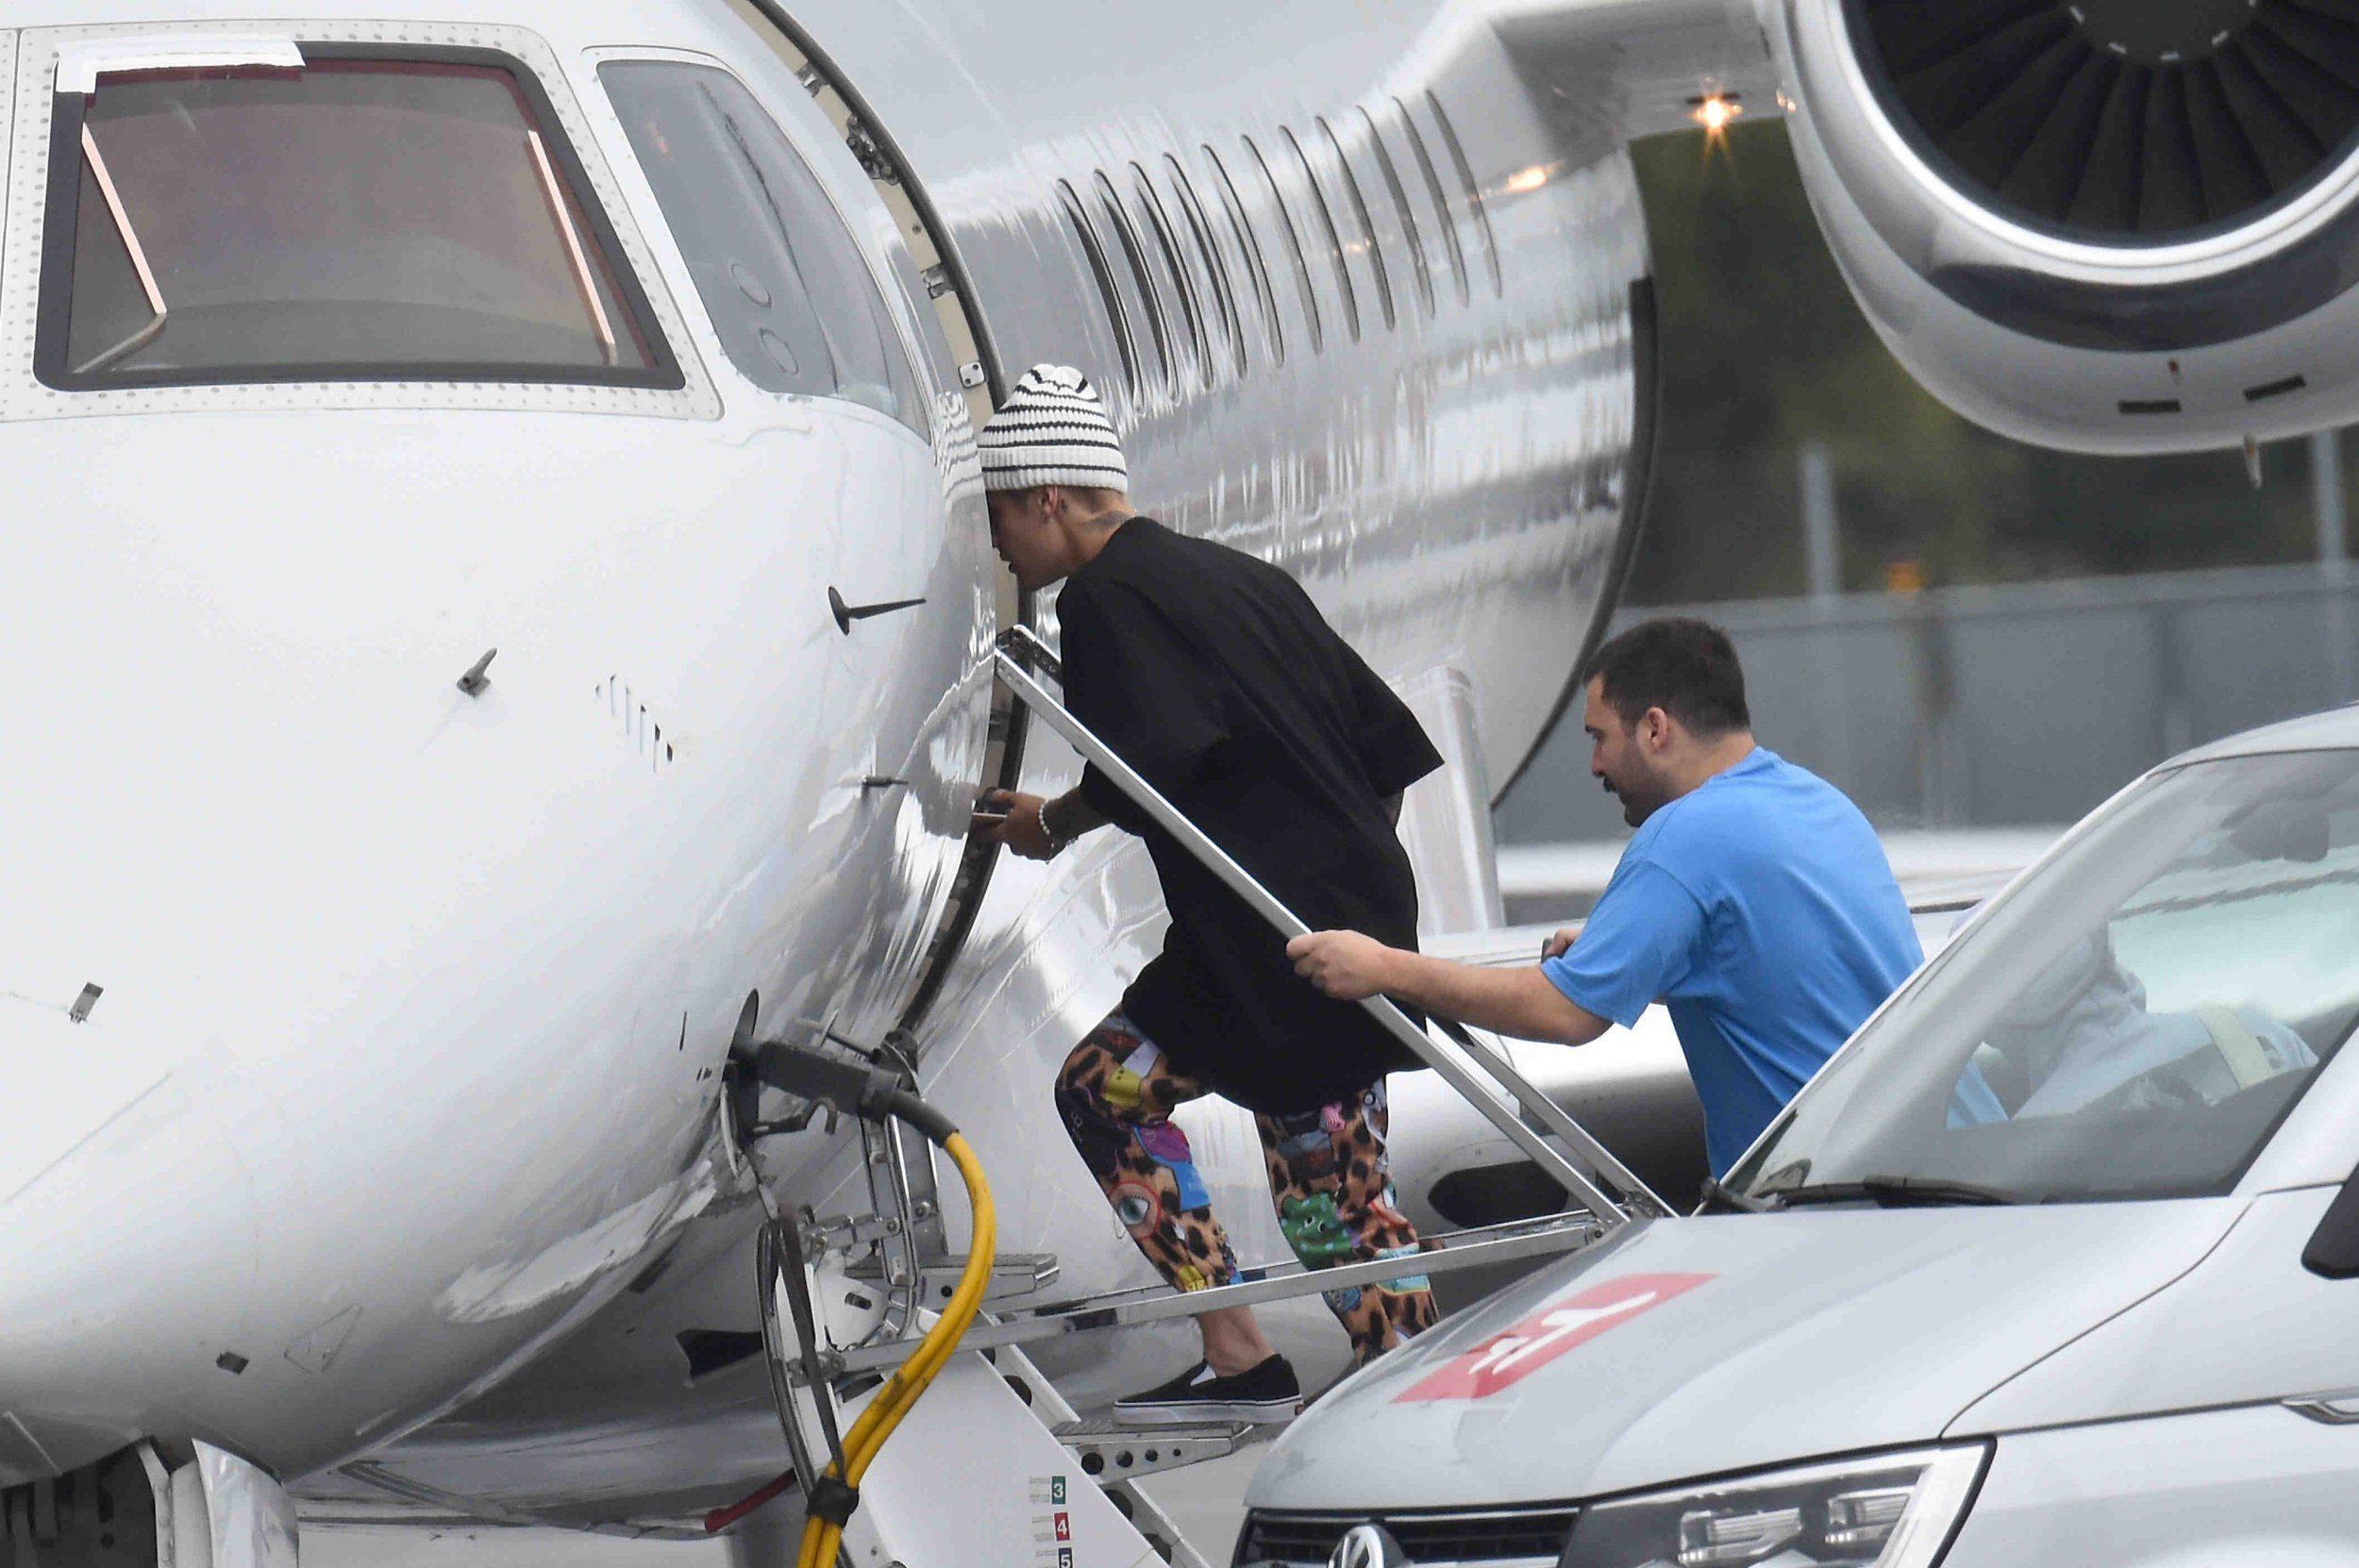 Mandatory Credit: Photo by BabiradPicture/REX/Shutterstock (5899163f) Justin Bieber Justin Bieber at Munich airport, Germany - 18 Sep 2016